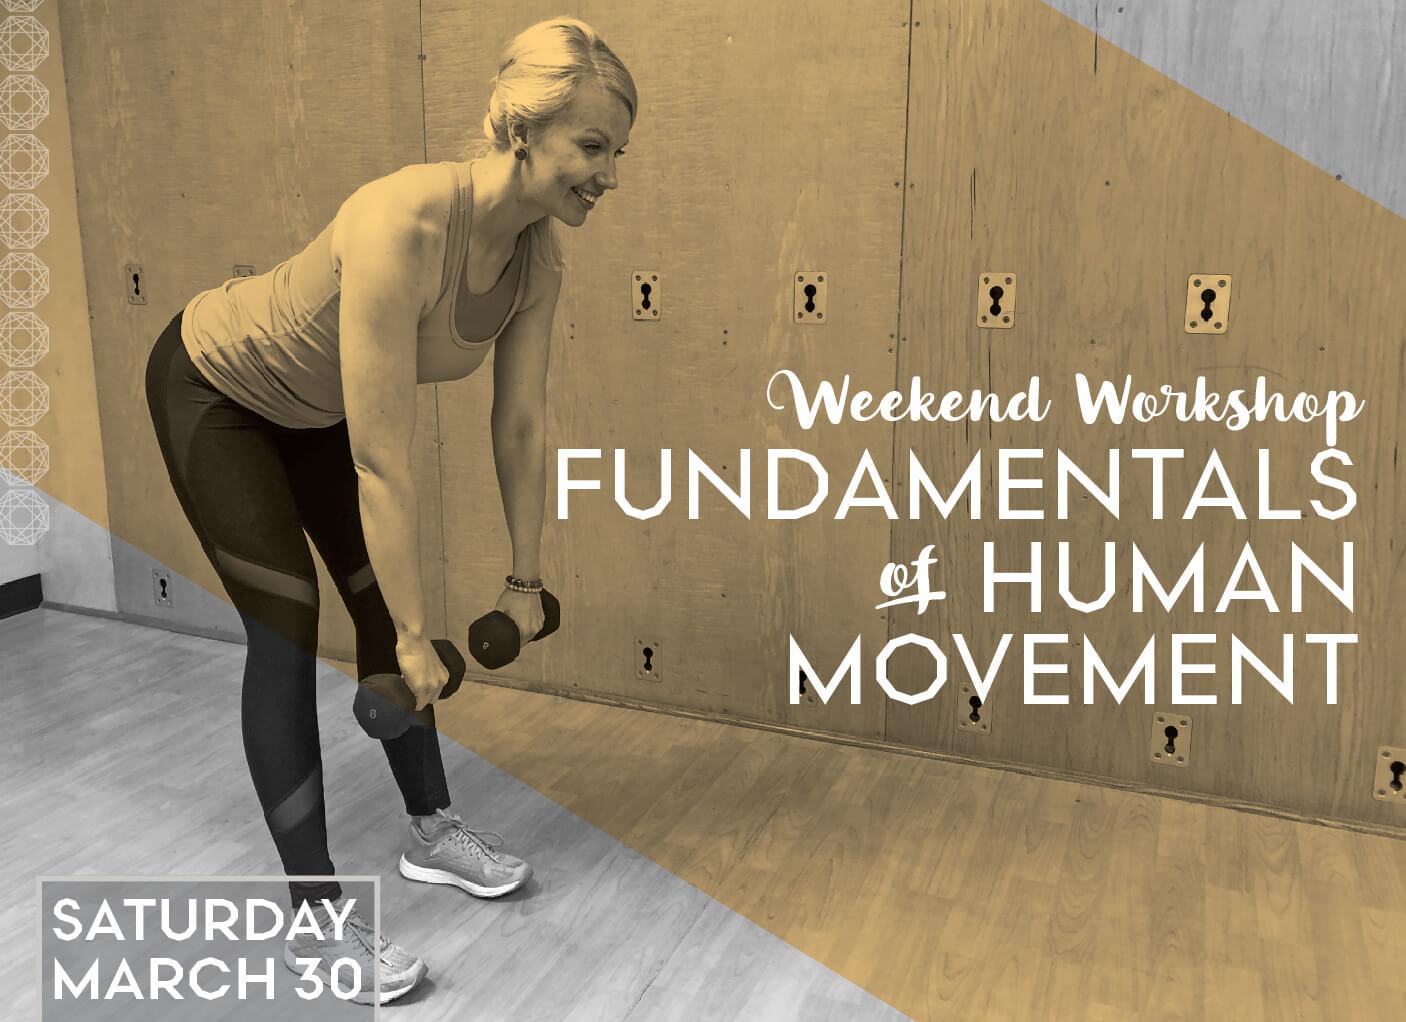 Fundamentals of Human Movement: Weekend Workshop